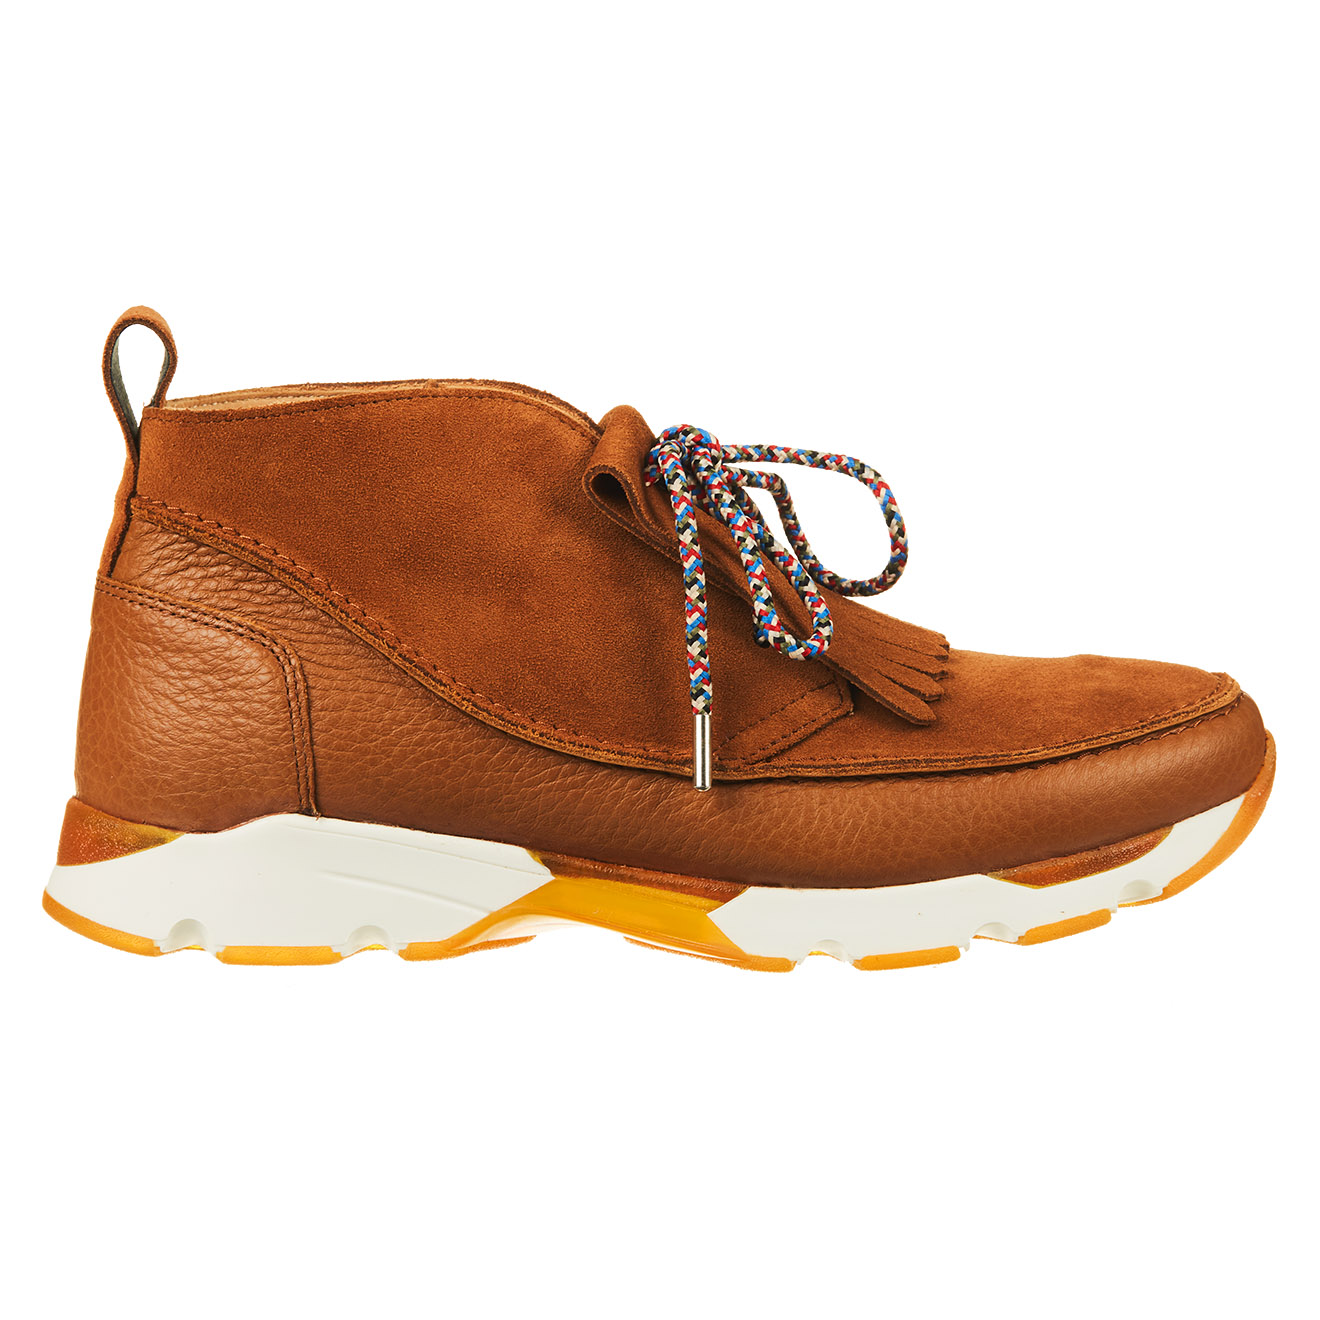 Sneakers à franges en Cuir cognac